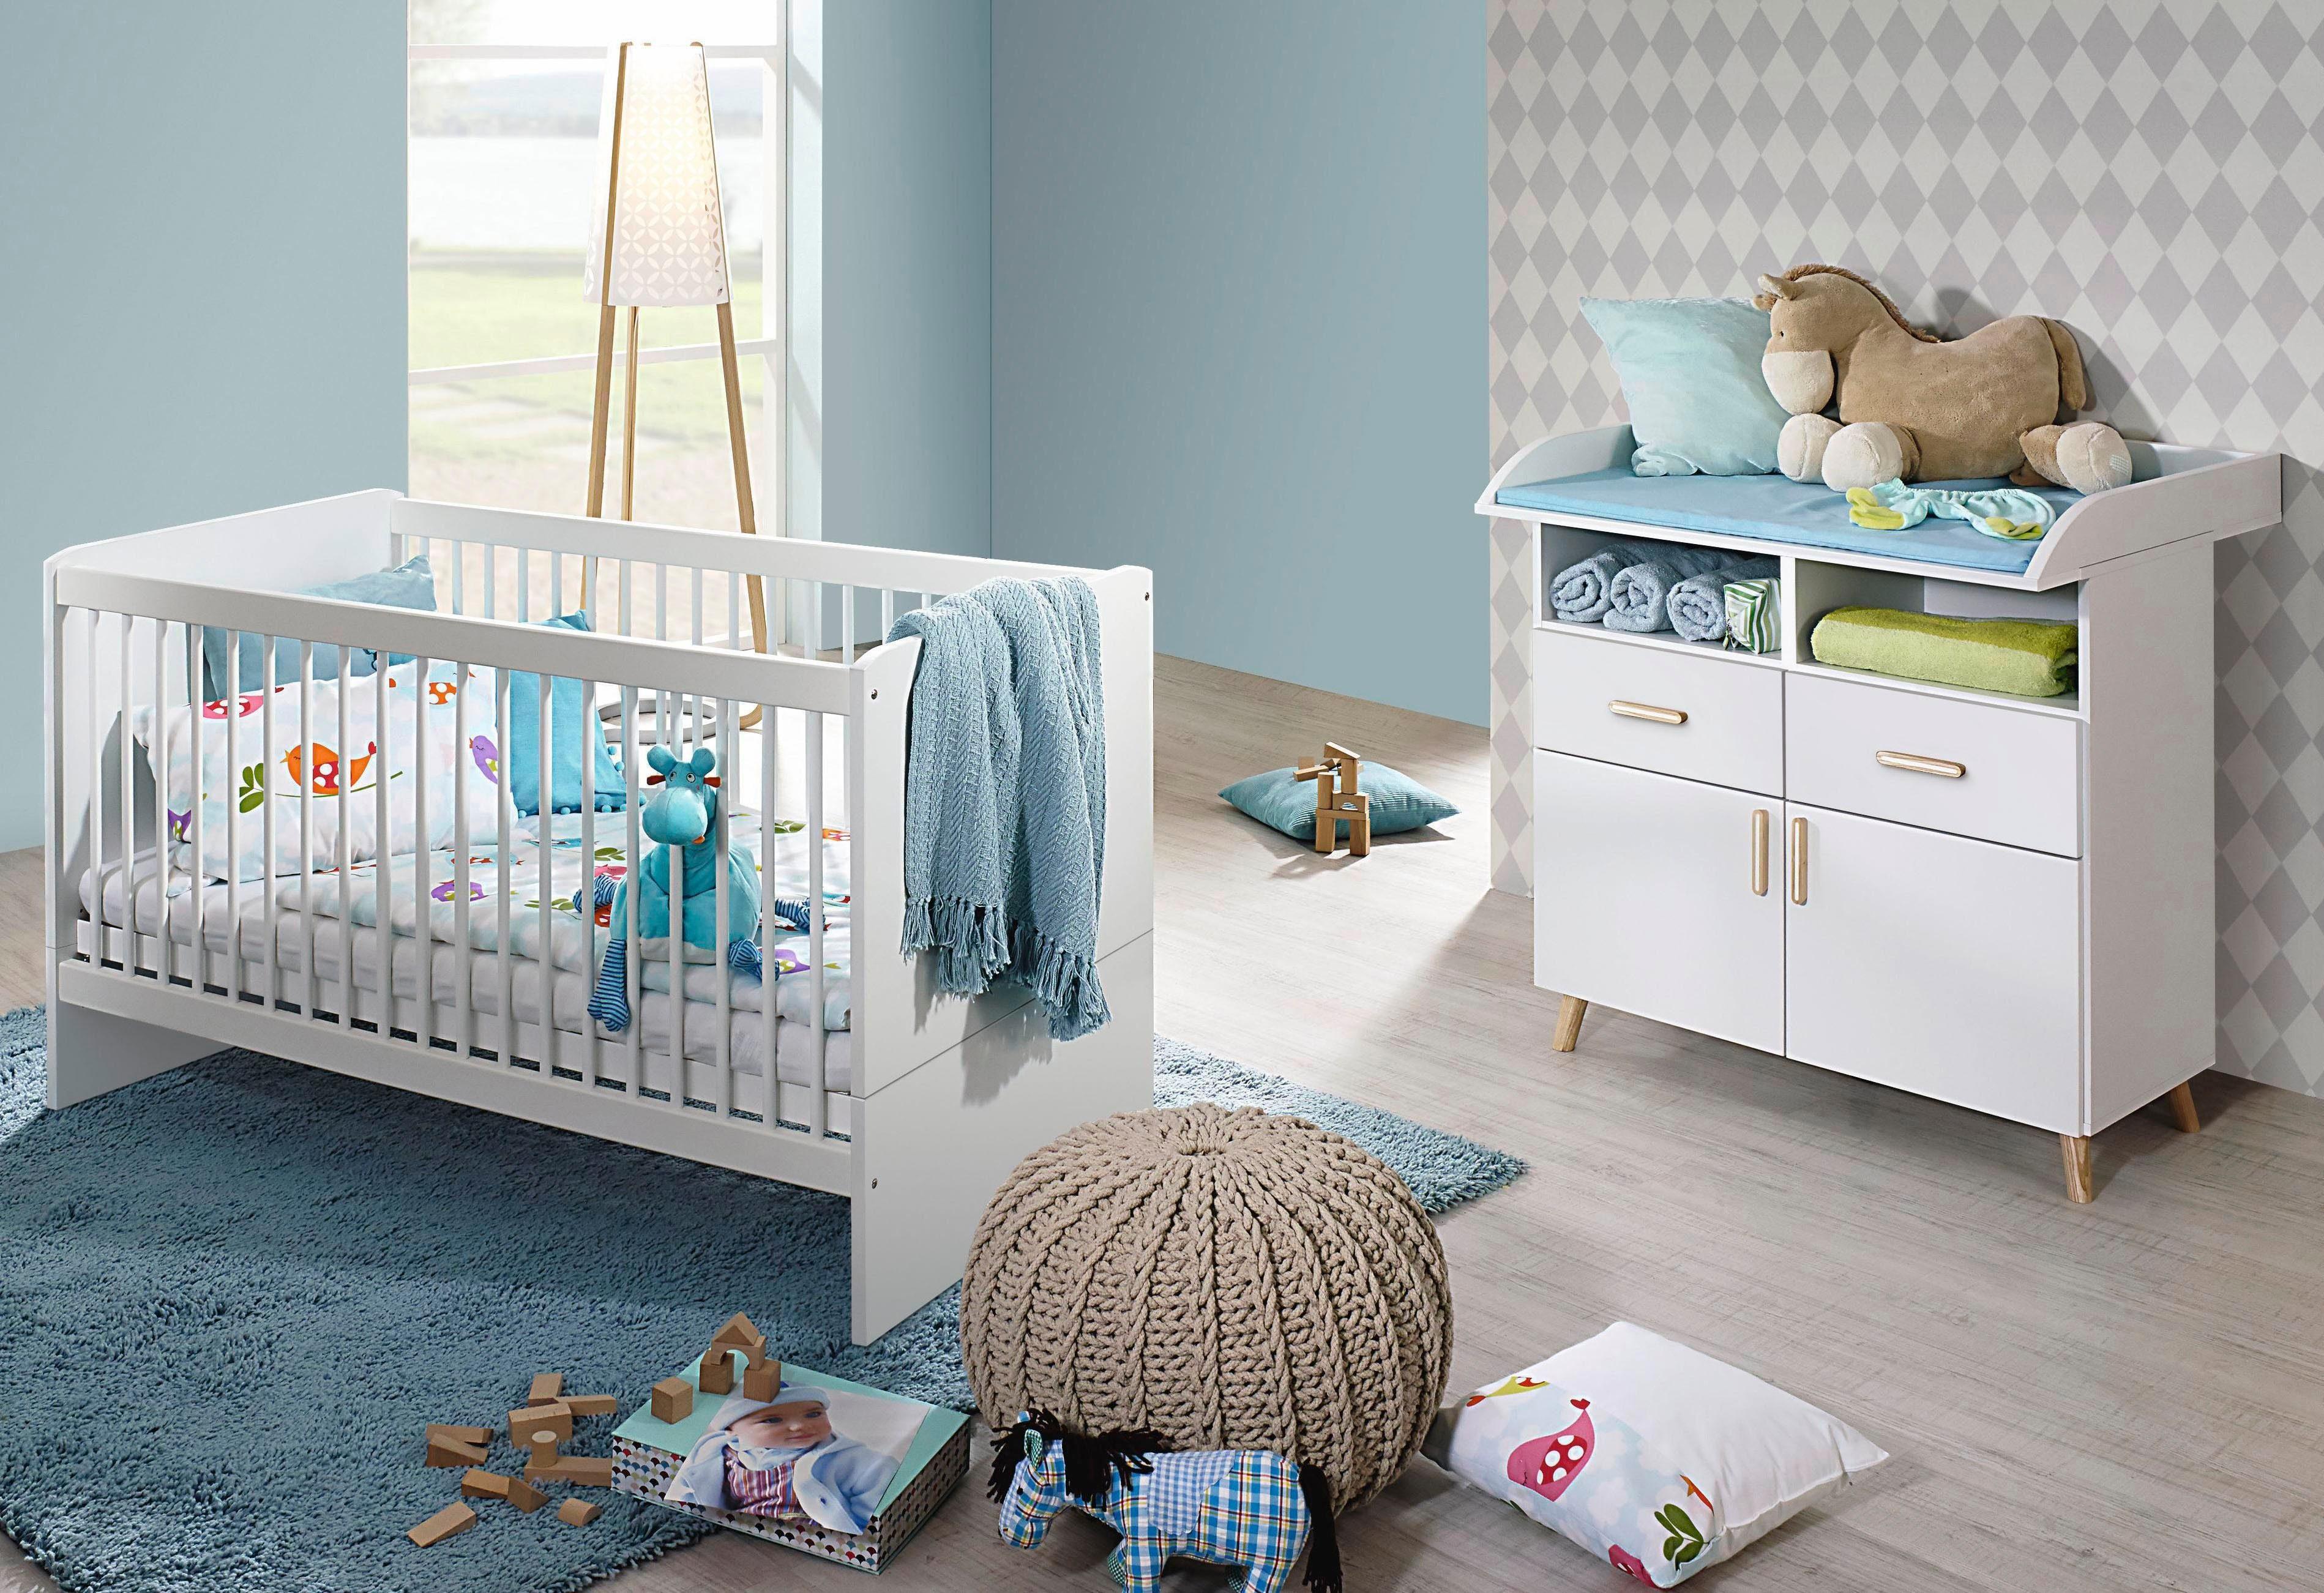 Babyzimmer Spar-Set »Potsdam«, Babybett + Wickelkommode (2-tlg.) in alpinweiß